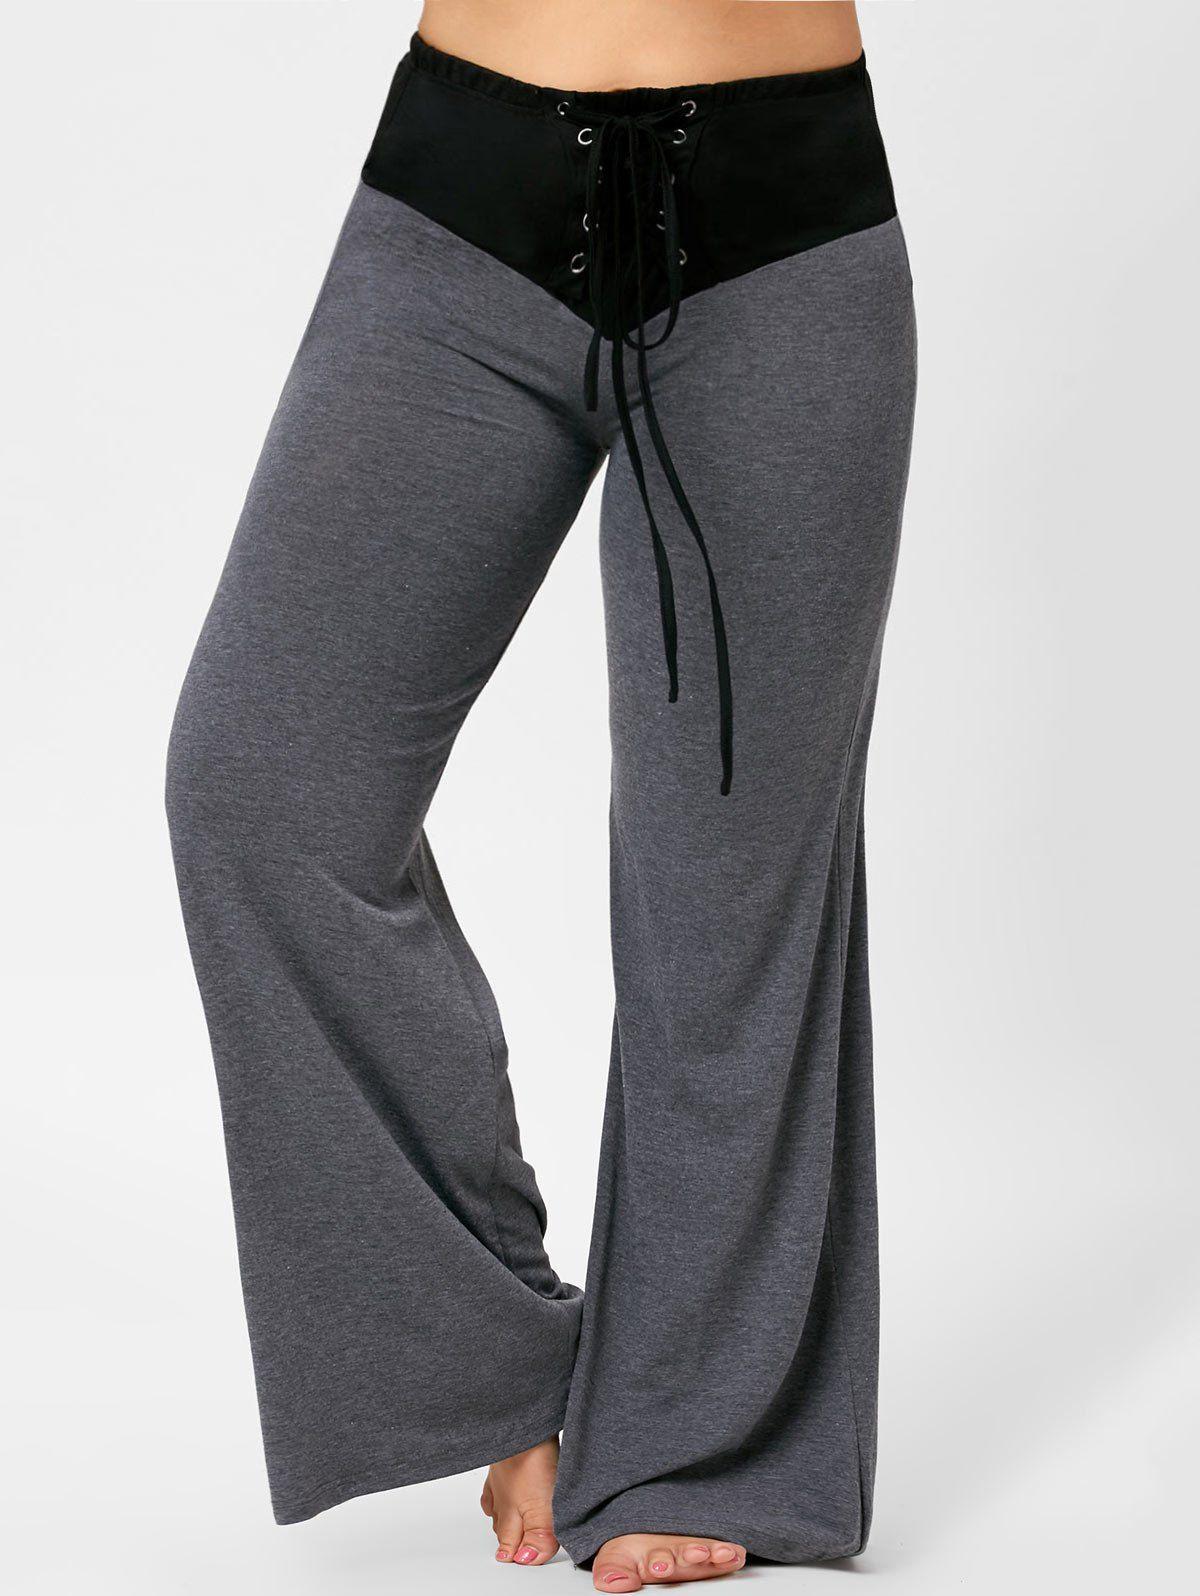 Plus Size Fashion | $11.87 | Two Tone Plus Size Lace-up Flare Pants | Sammydress.com